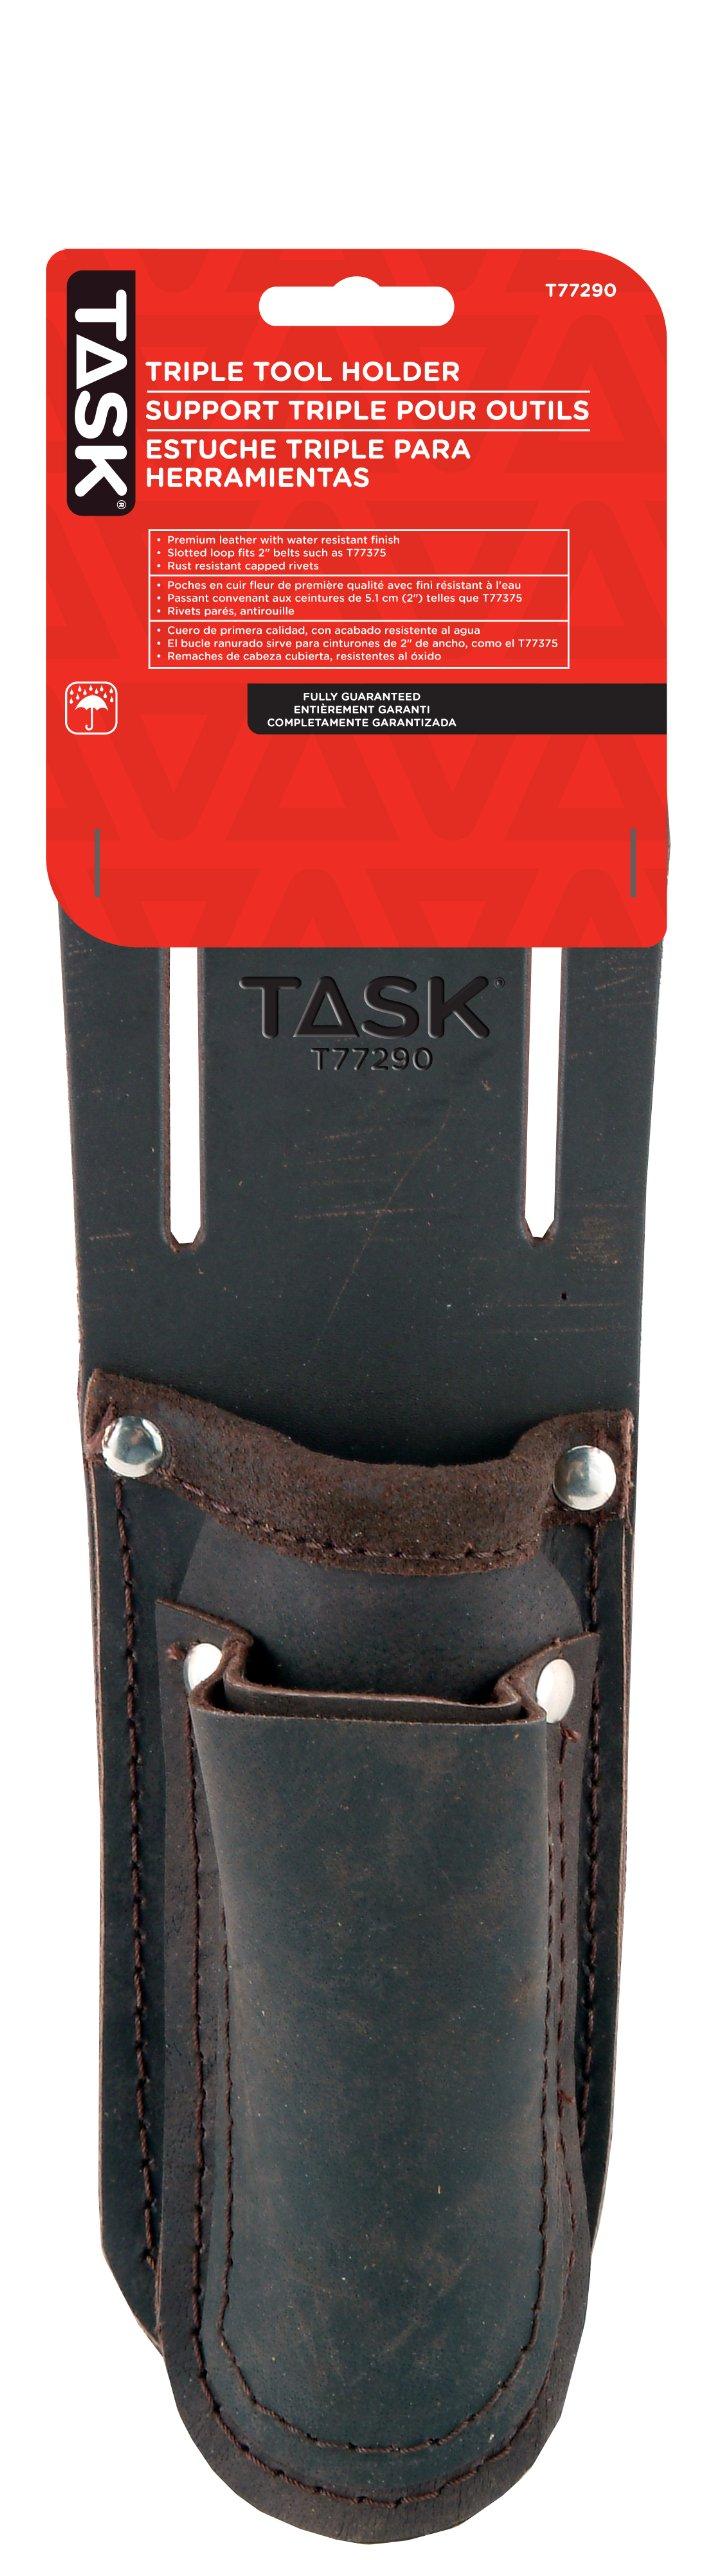 Task Tools T77290 Tradesperson's Leather Triple Tool Holder, 3-Pocket